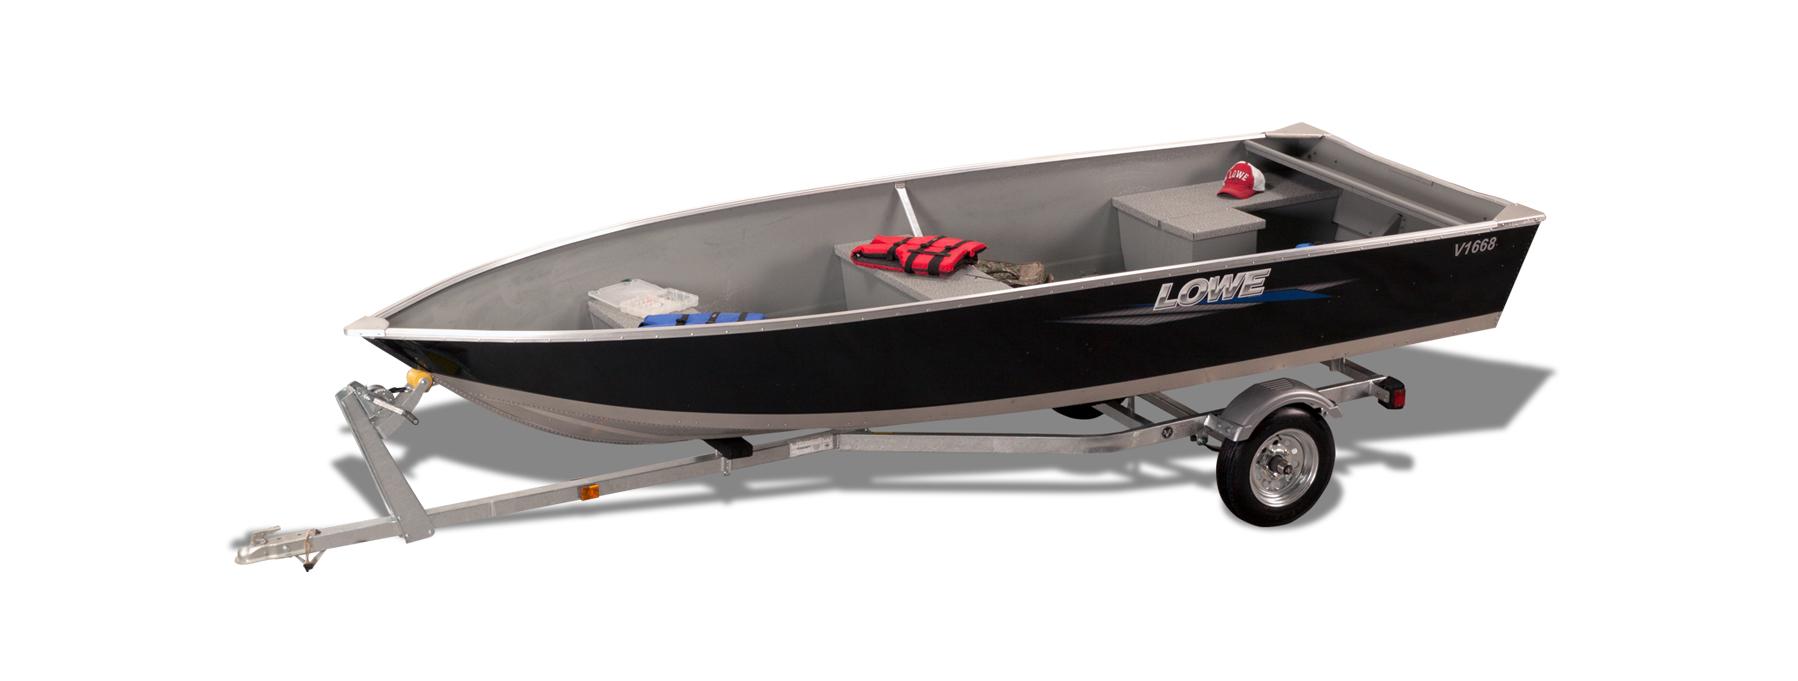 2019 Aluminum Deep V Utility V1668 Boats | Lowe Boats